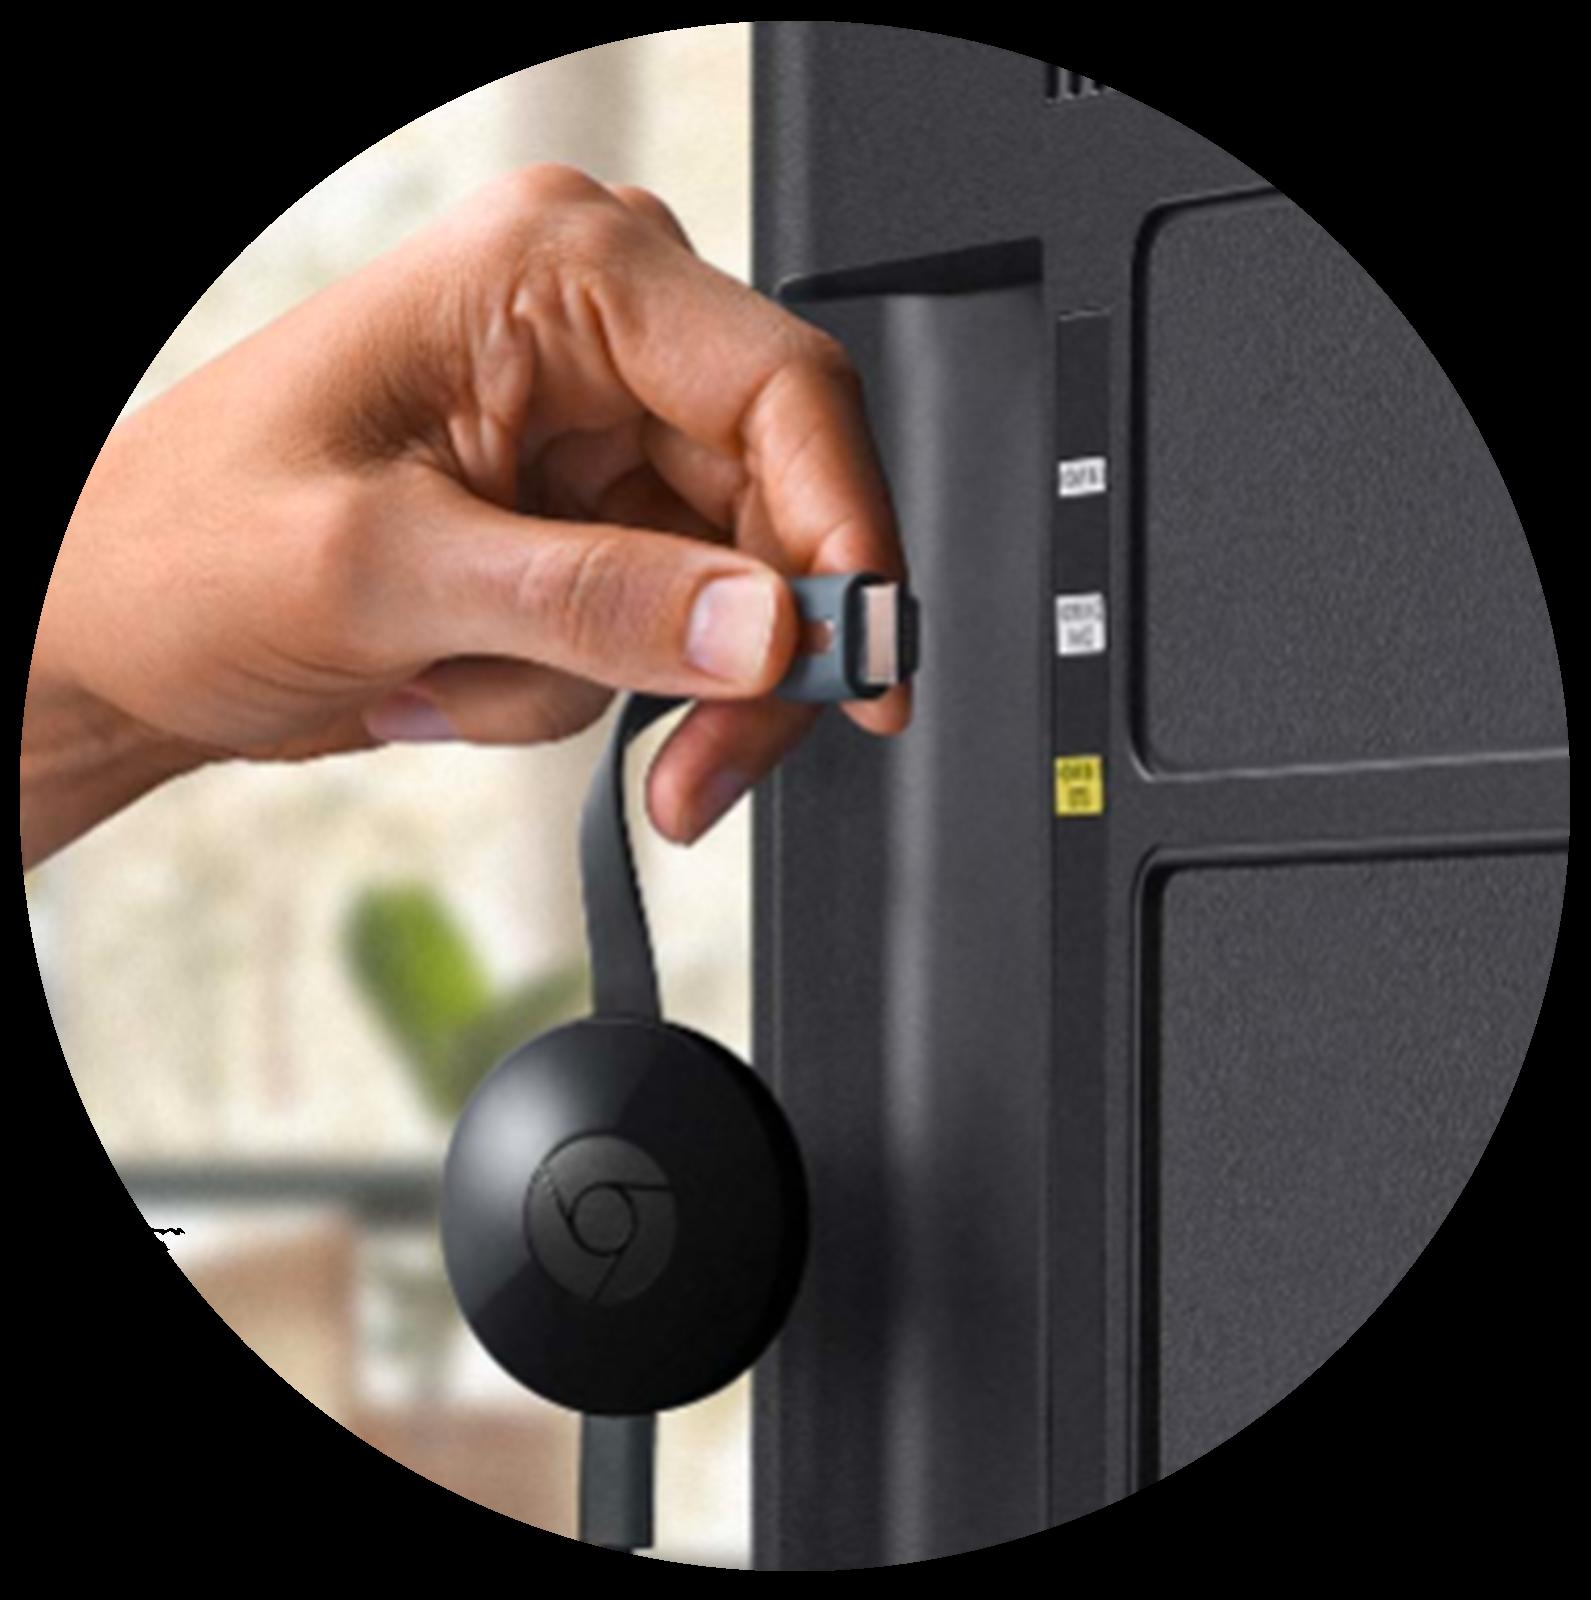 Plug Chromecast In